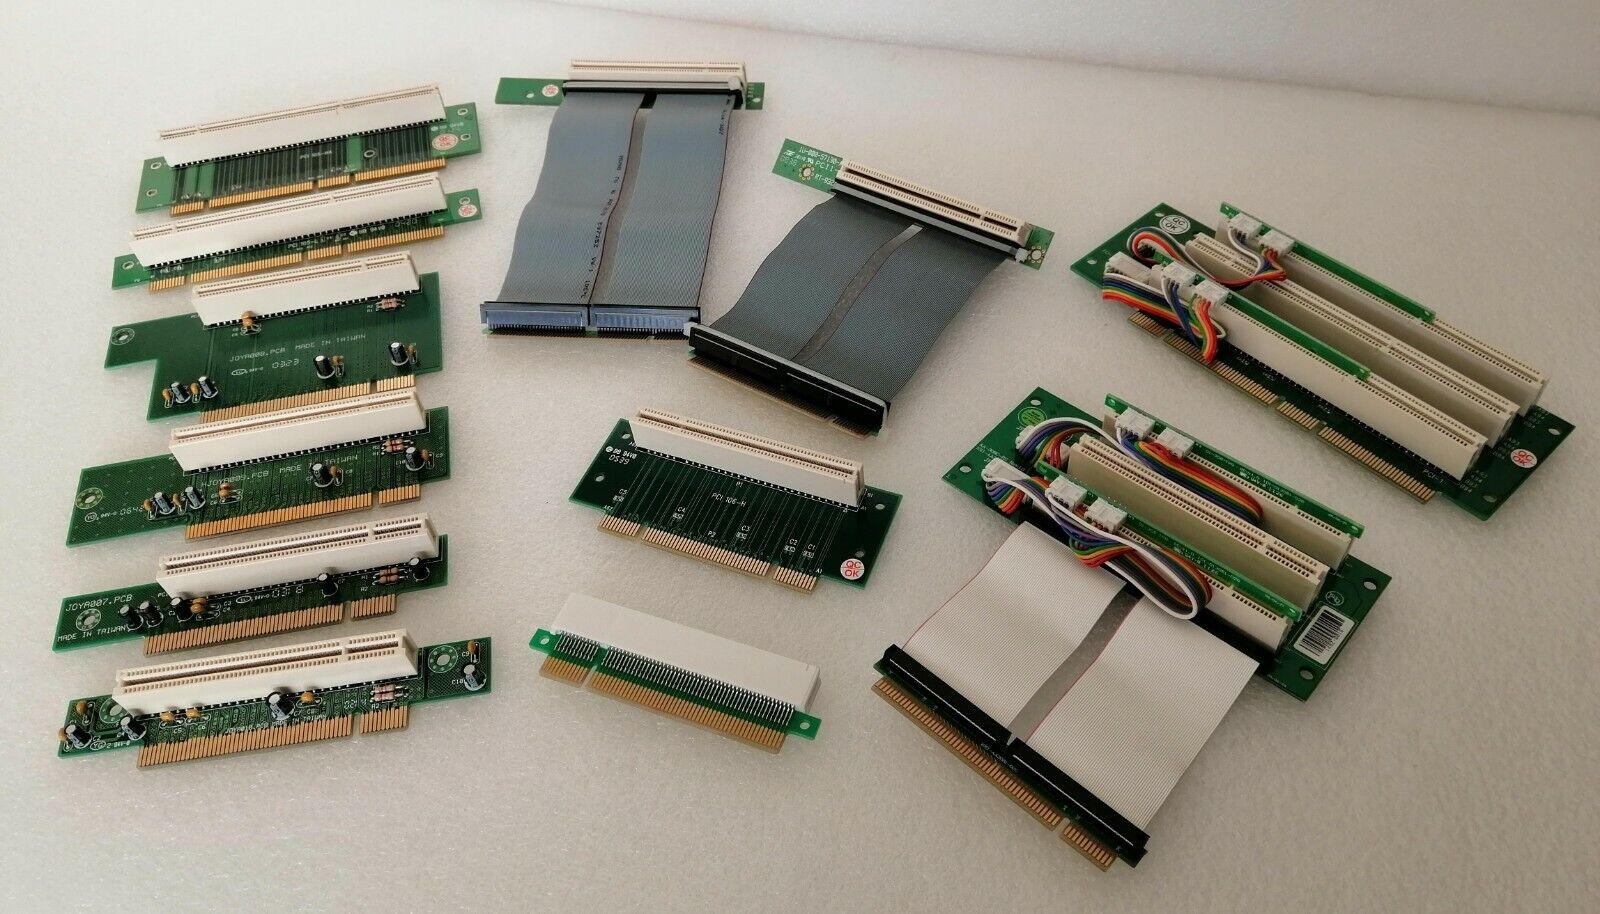 - 1x and 3x Slots PCI Riser Card 3.3V / 5.0V / 32Bit / 64Bit